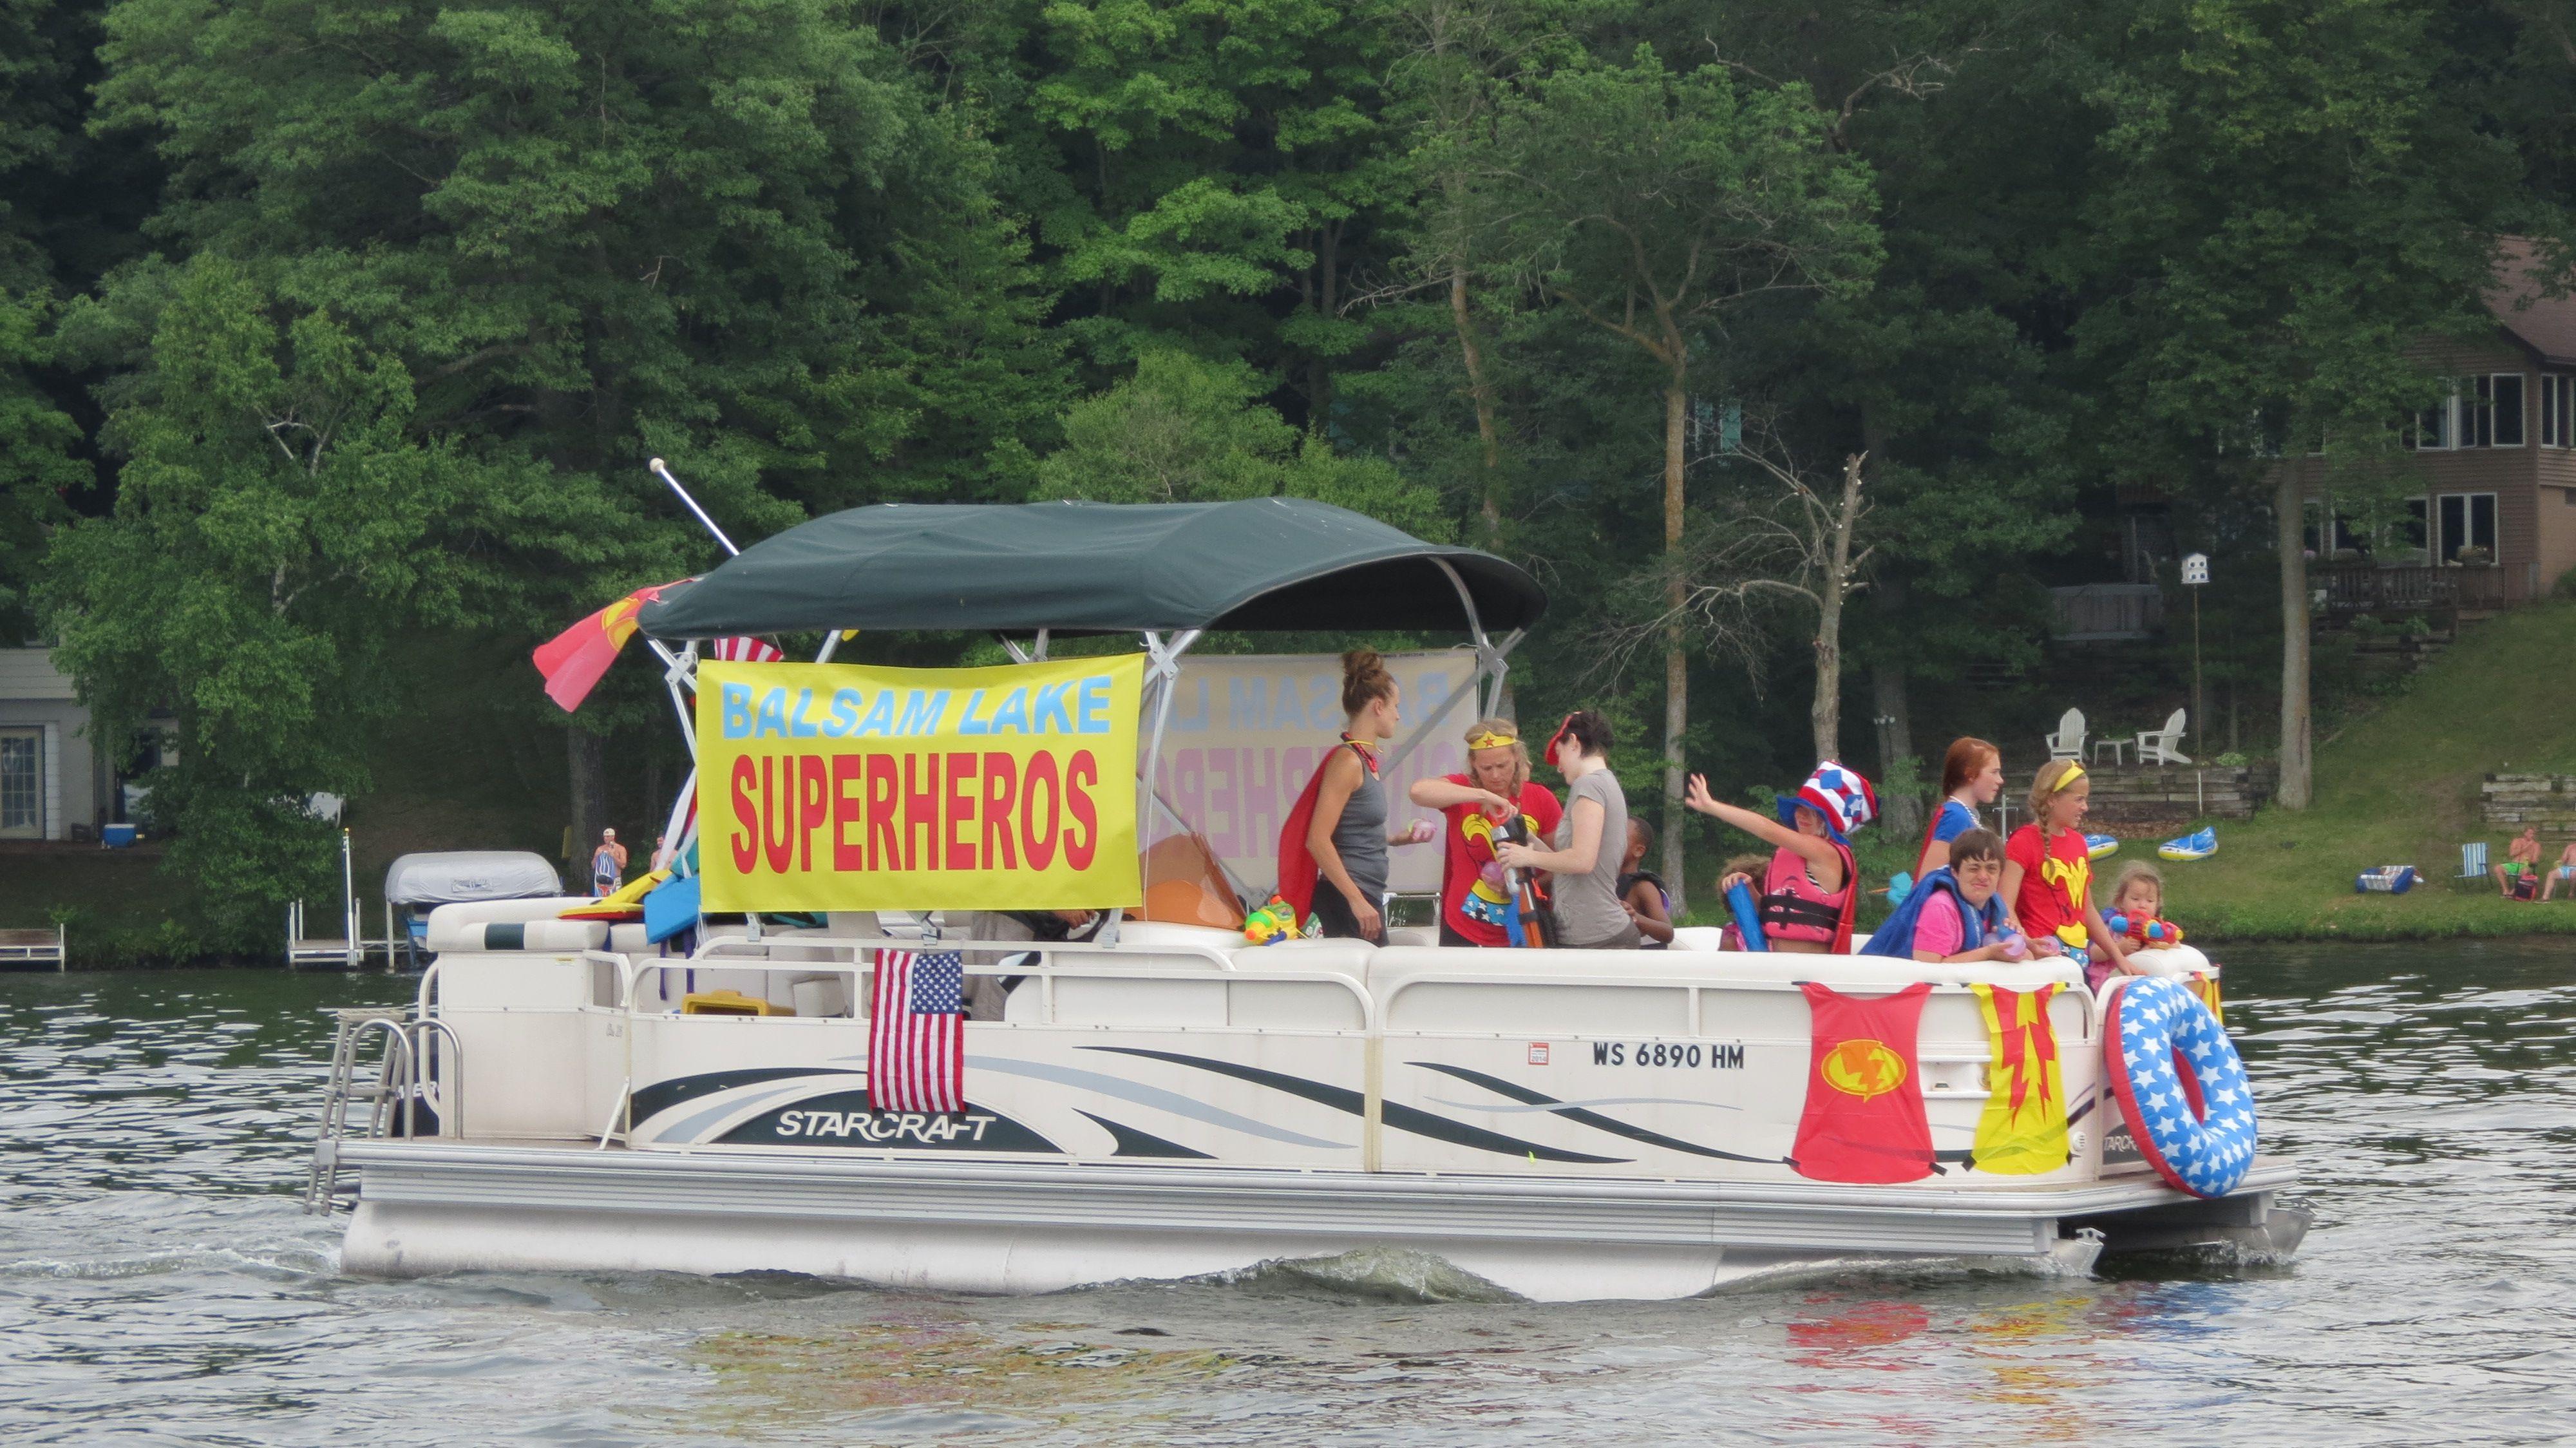 Fourth Of July Boat Parade Boat Parade Lake Boat Pontoon Boat